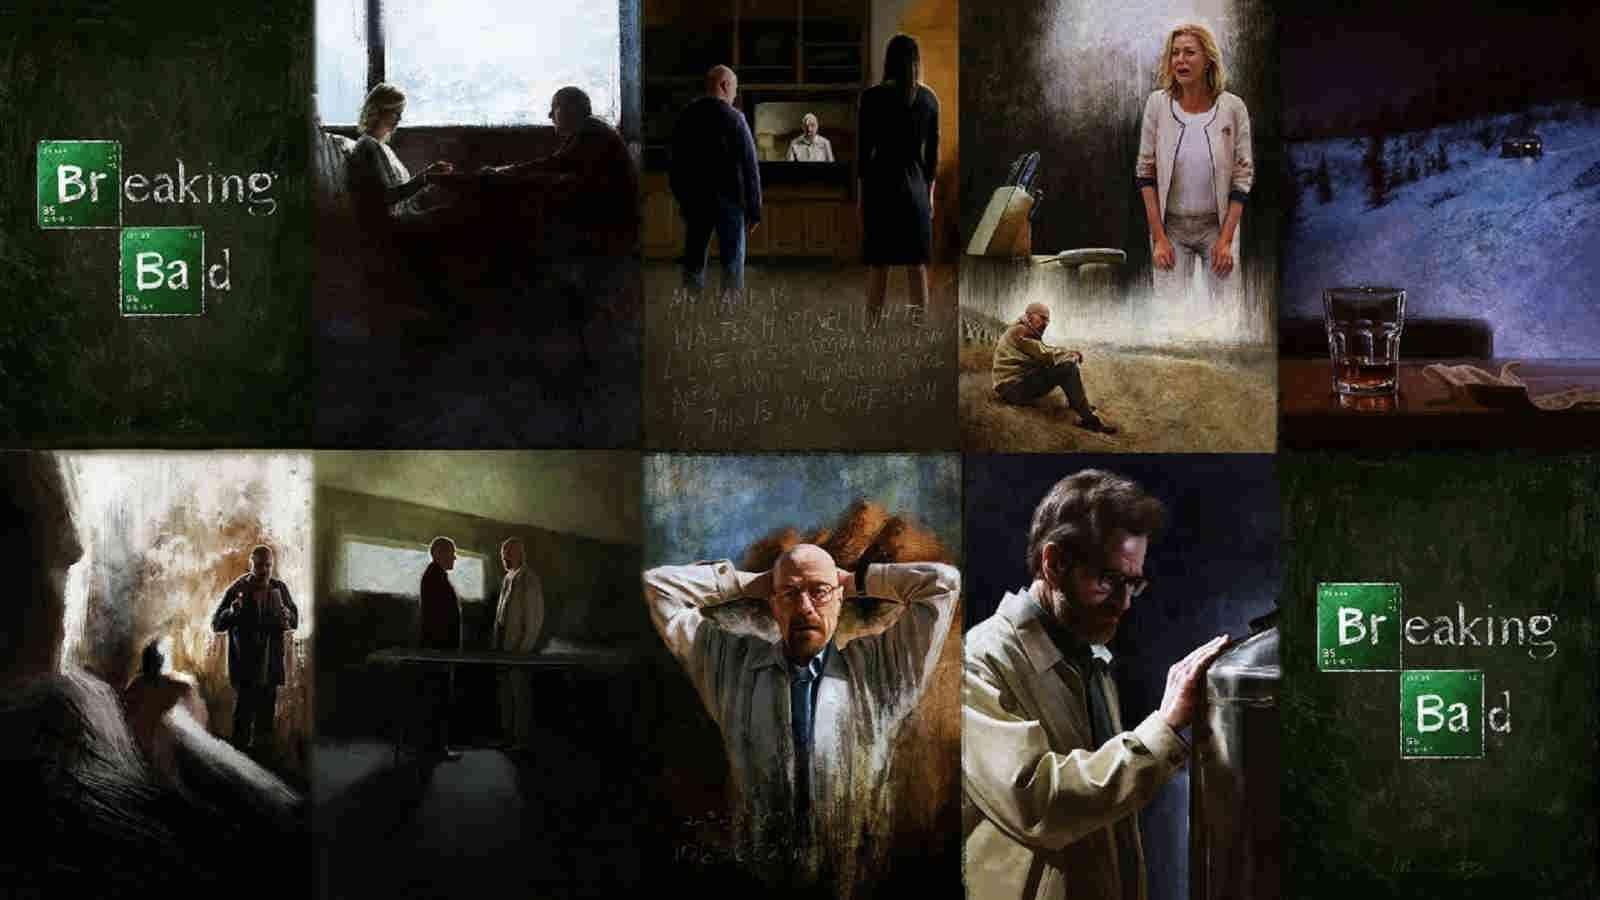 Breaking Bad ScreenSouts - سریال بریکینگ بد Breaking Bad فصل پنجم با دوبله فارسی قسمت ۳